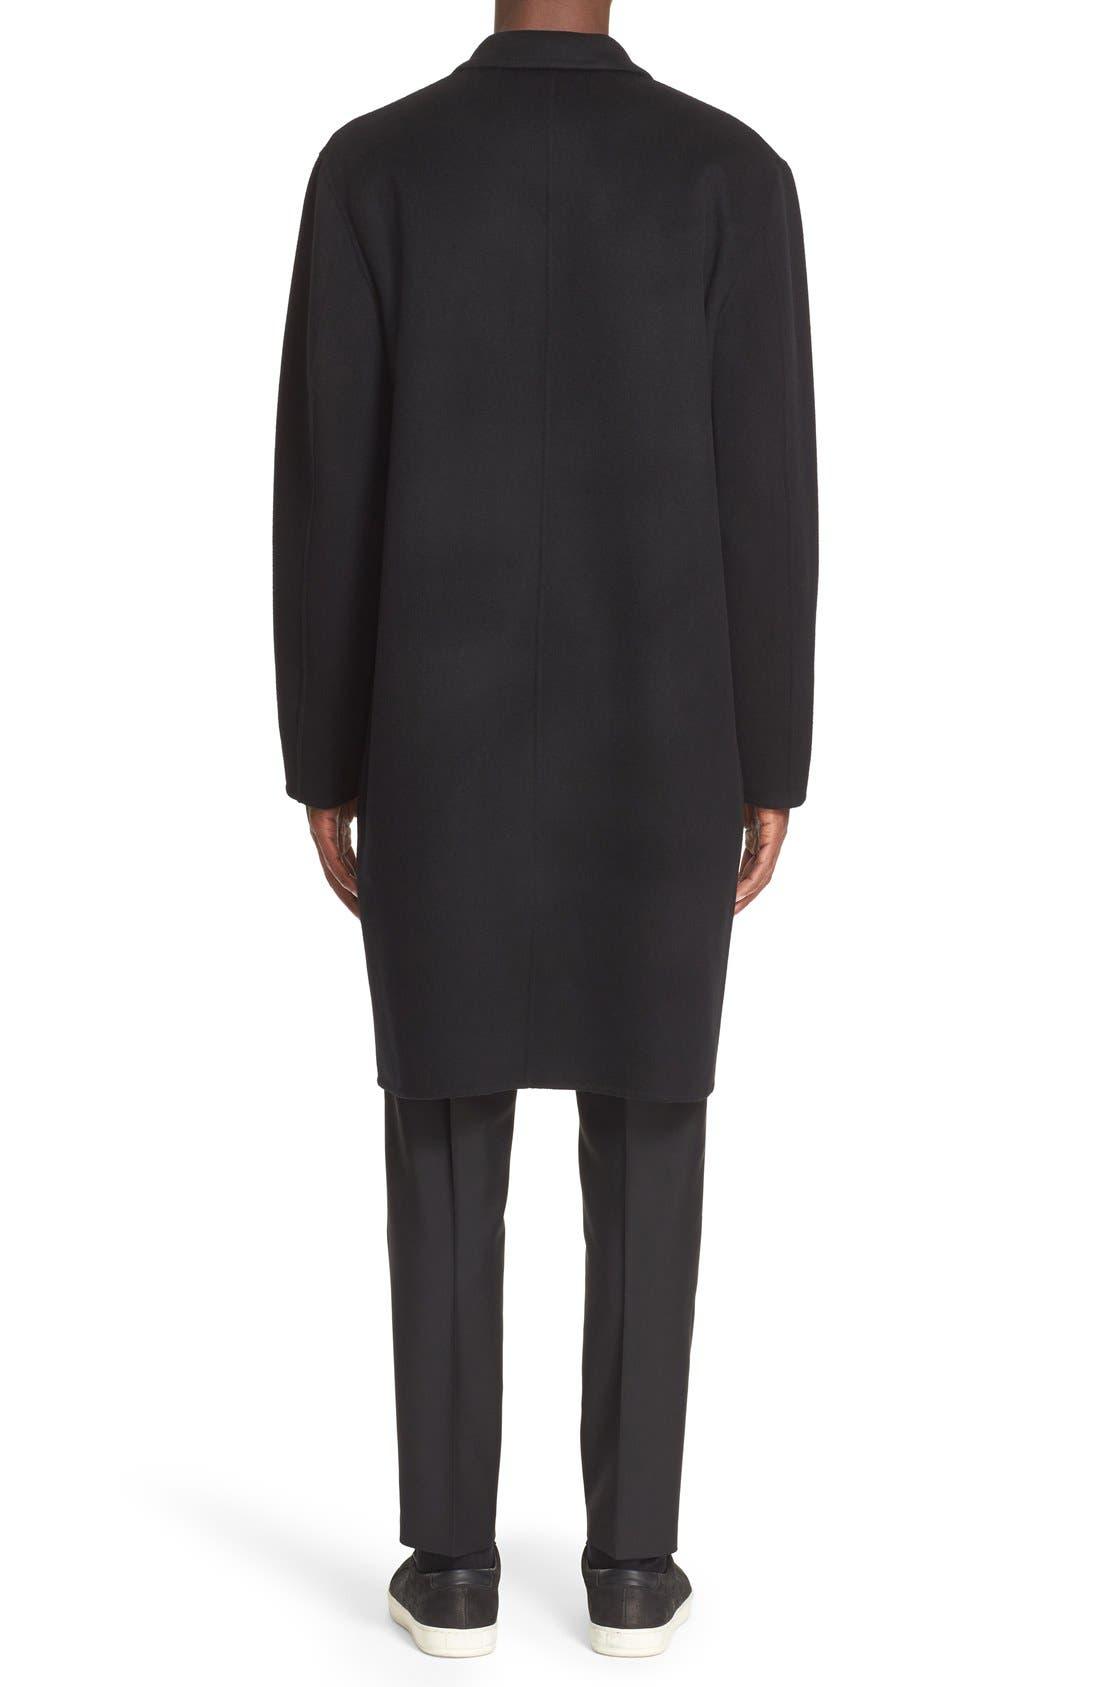 Charles Wool & Cashmere Coat,                             Alternate thumbnail 2, color,                             Black